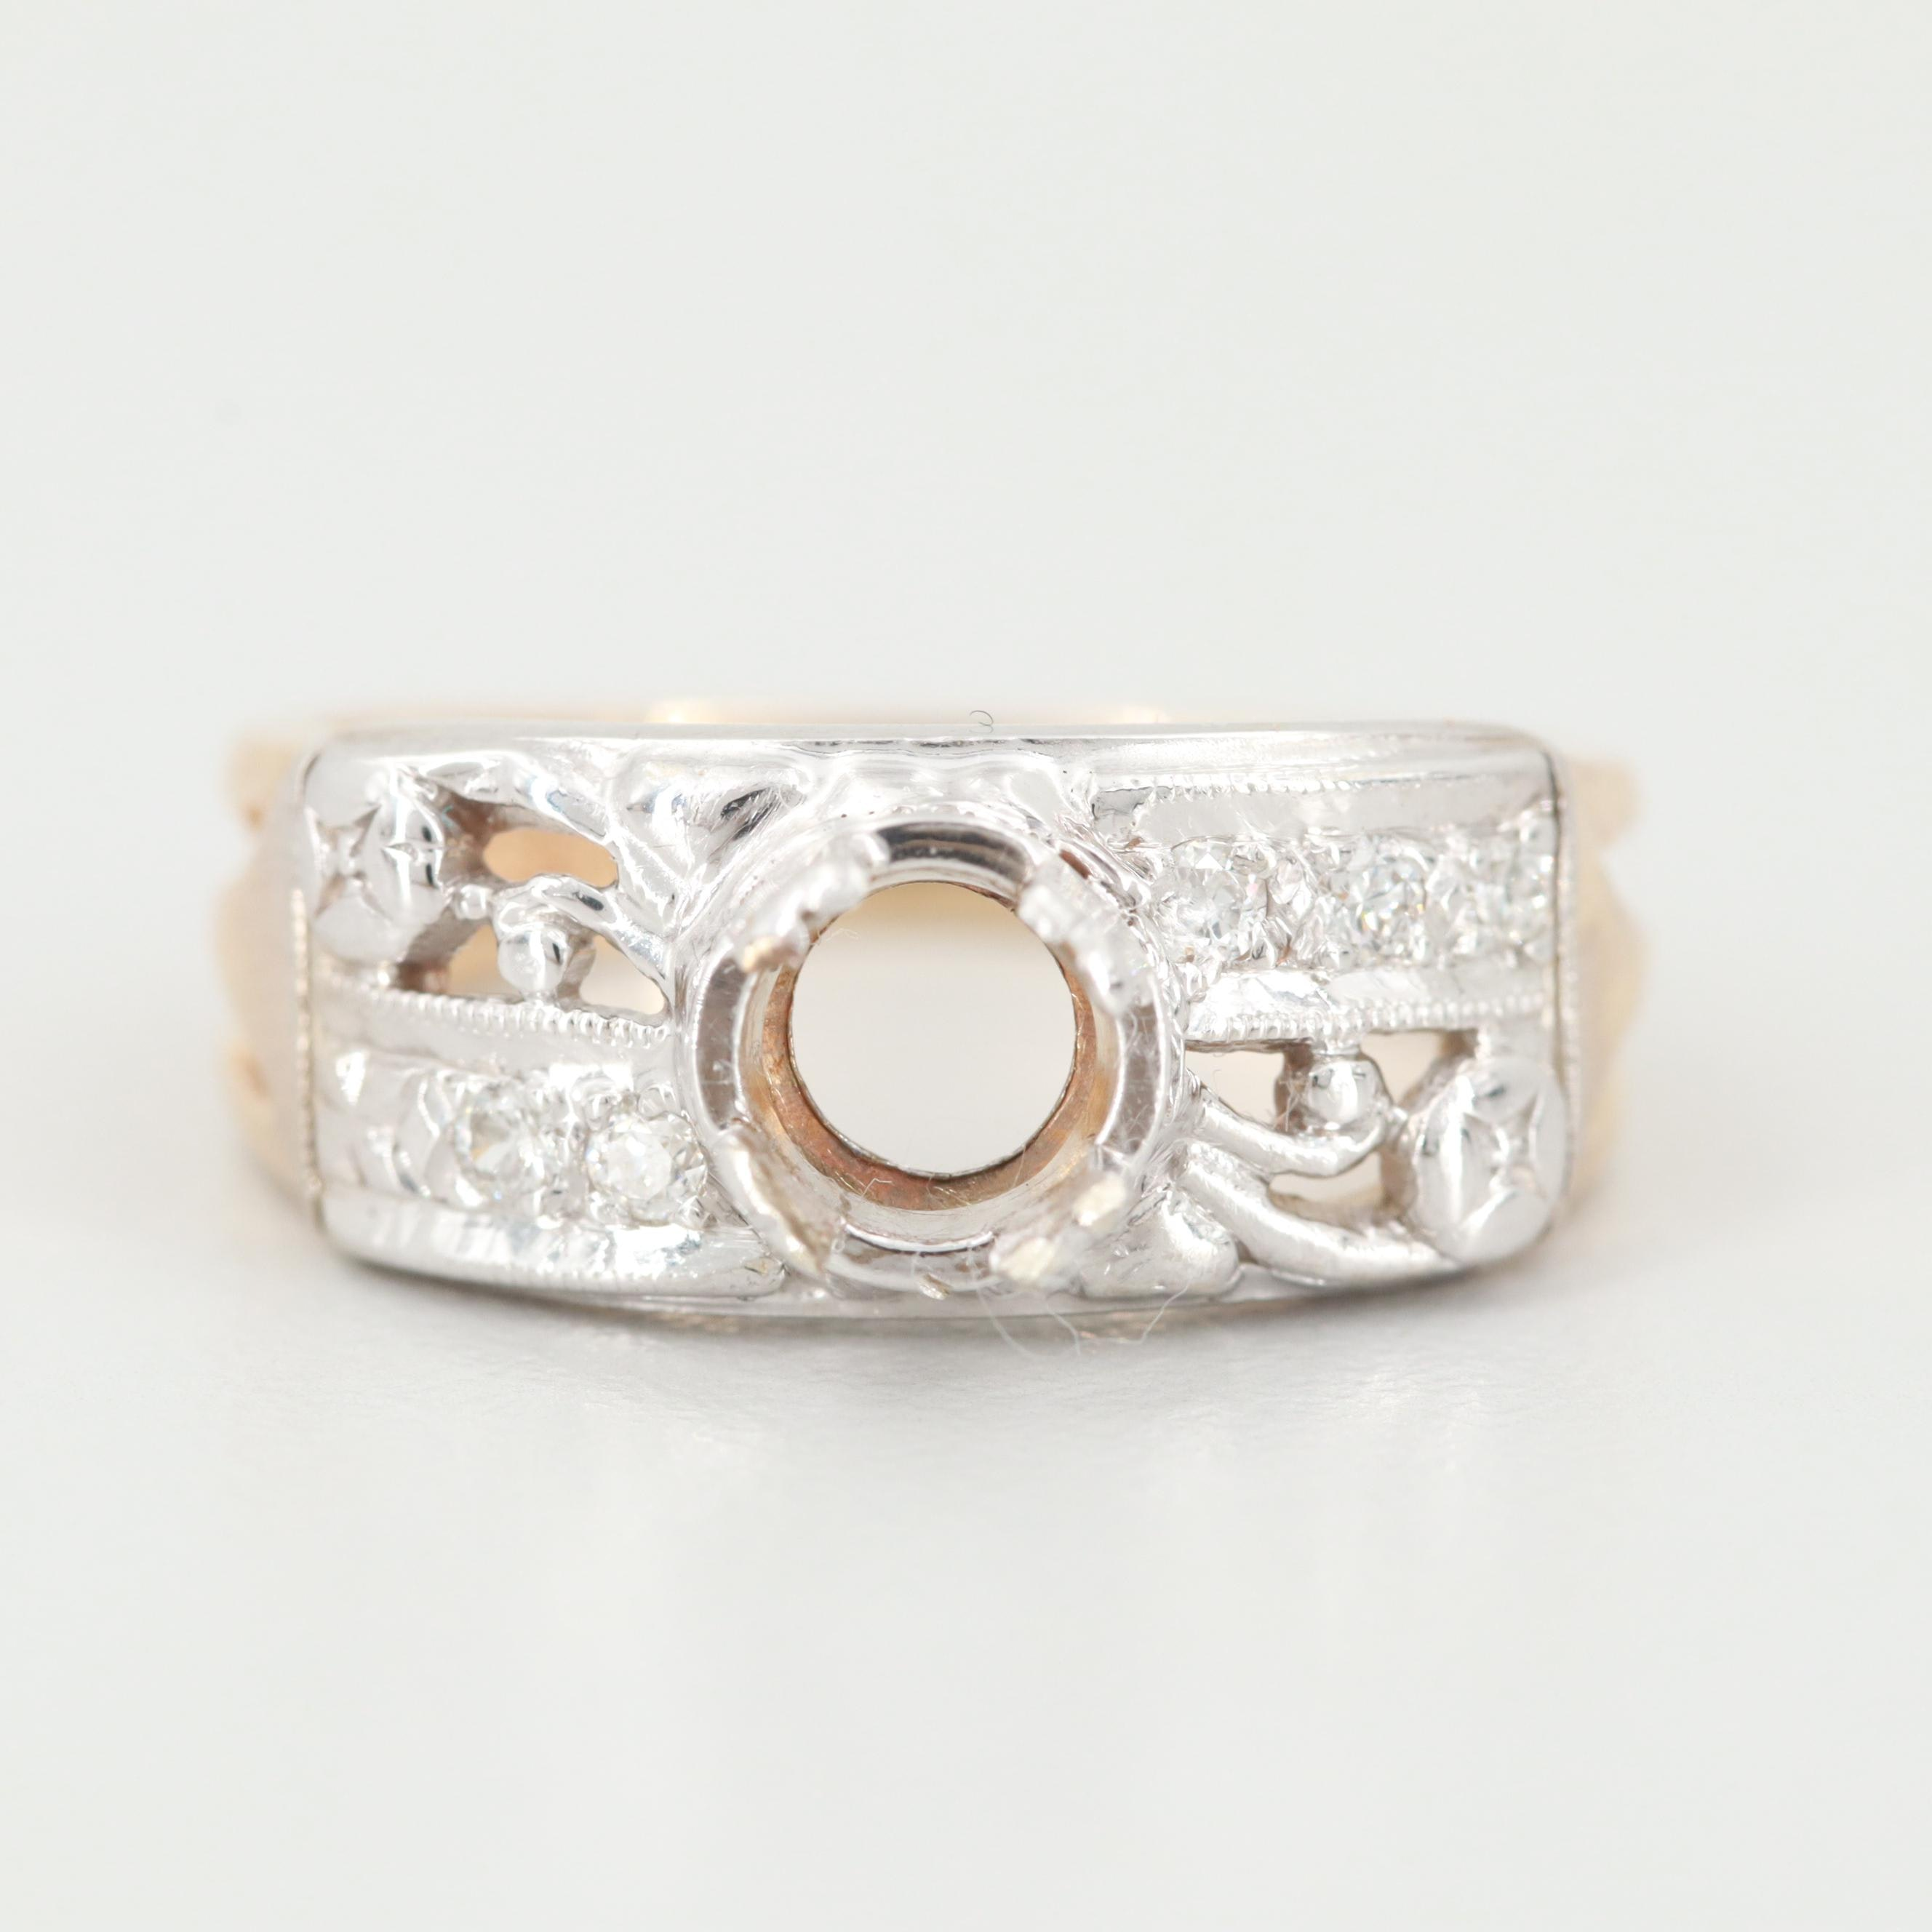 14K Yellow and White Gold Diamond Semi Mount Ring